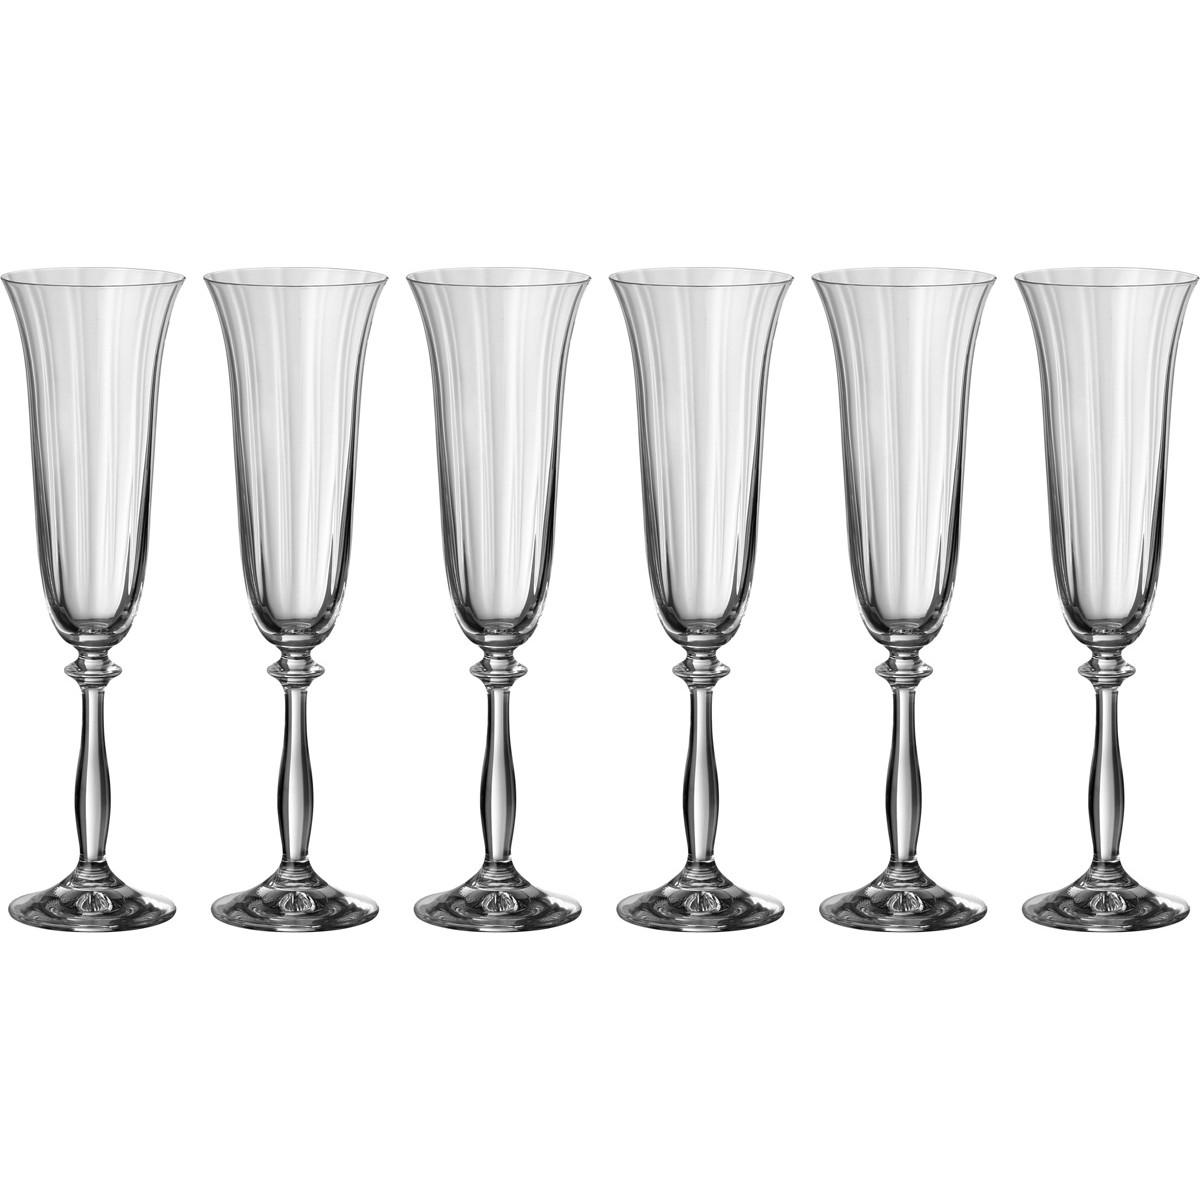 {} Bohemia Crystal Набор бокалов для шампанского Darlene (24 см - 6 шт) bohemia crystal набор бокалов для шампанского felina 25 см 2 шт